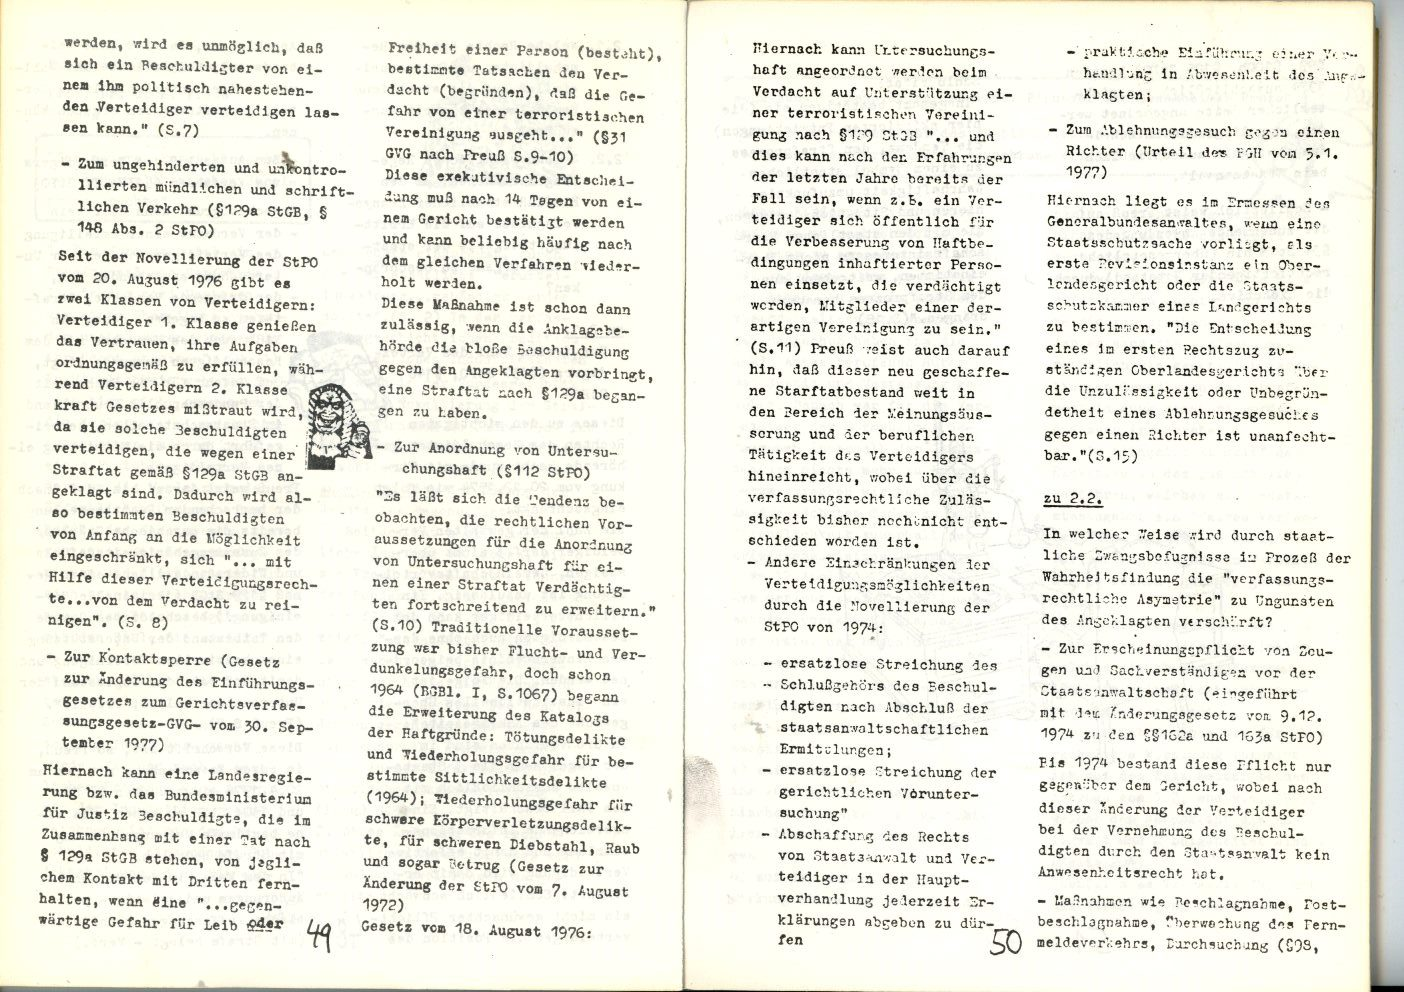 Marburg_Russell_Initiative_1978_26